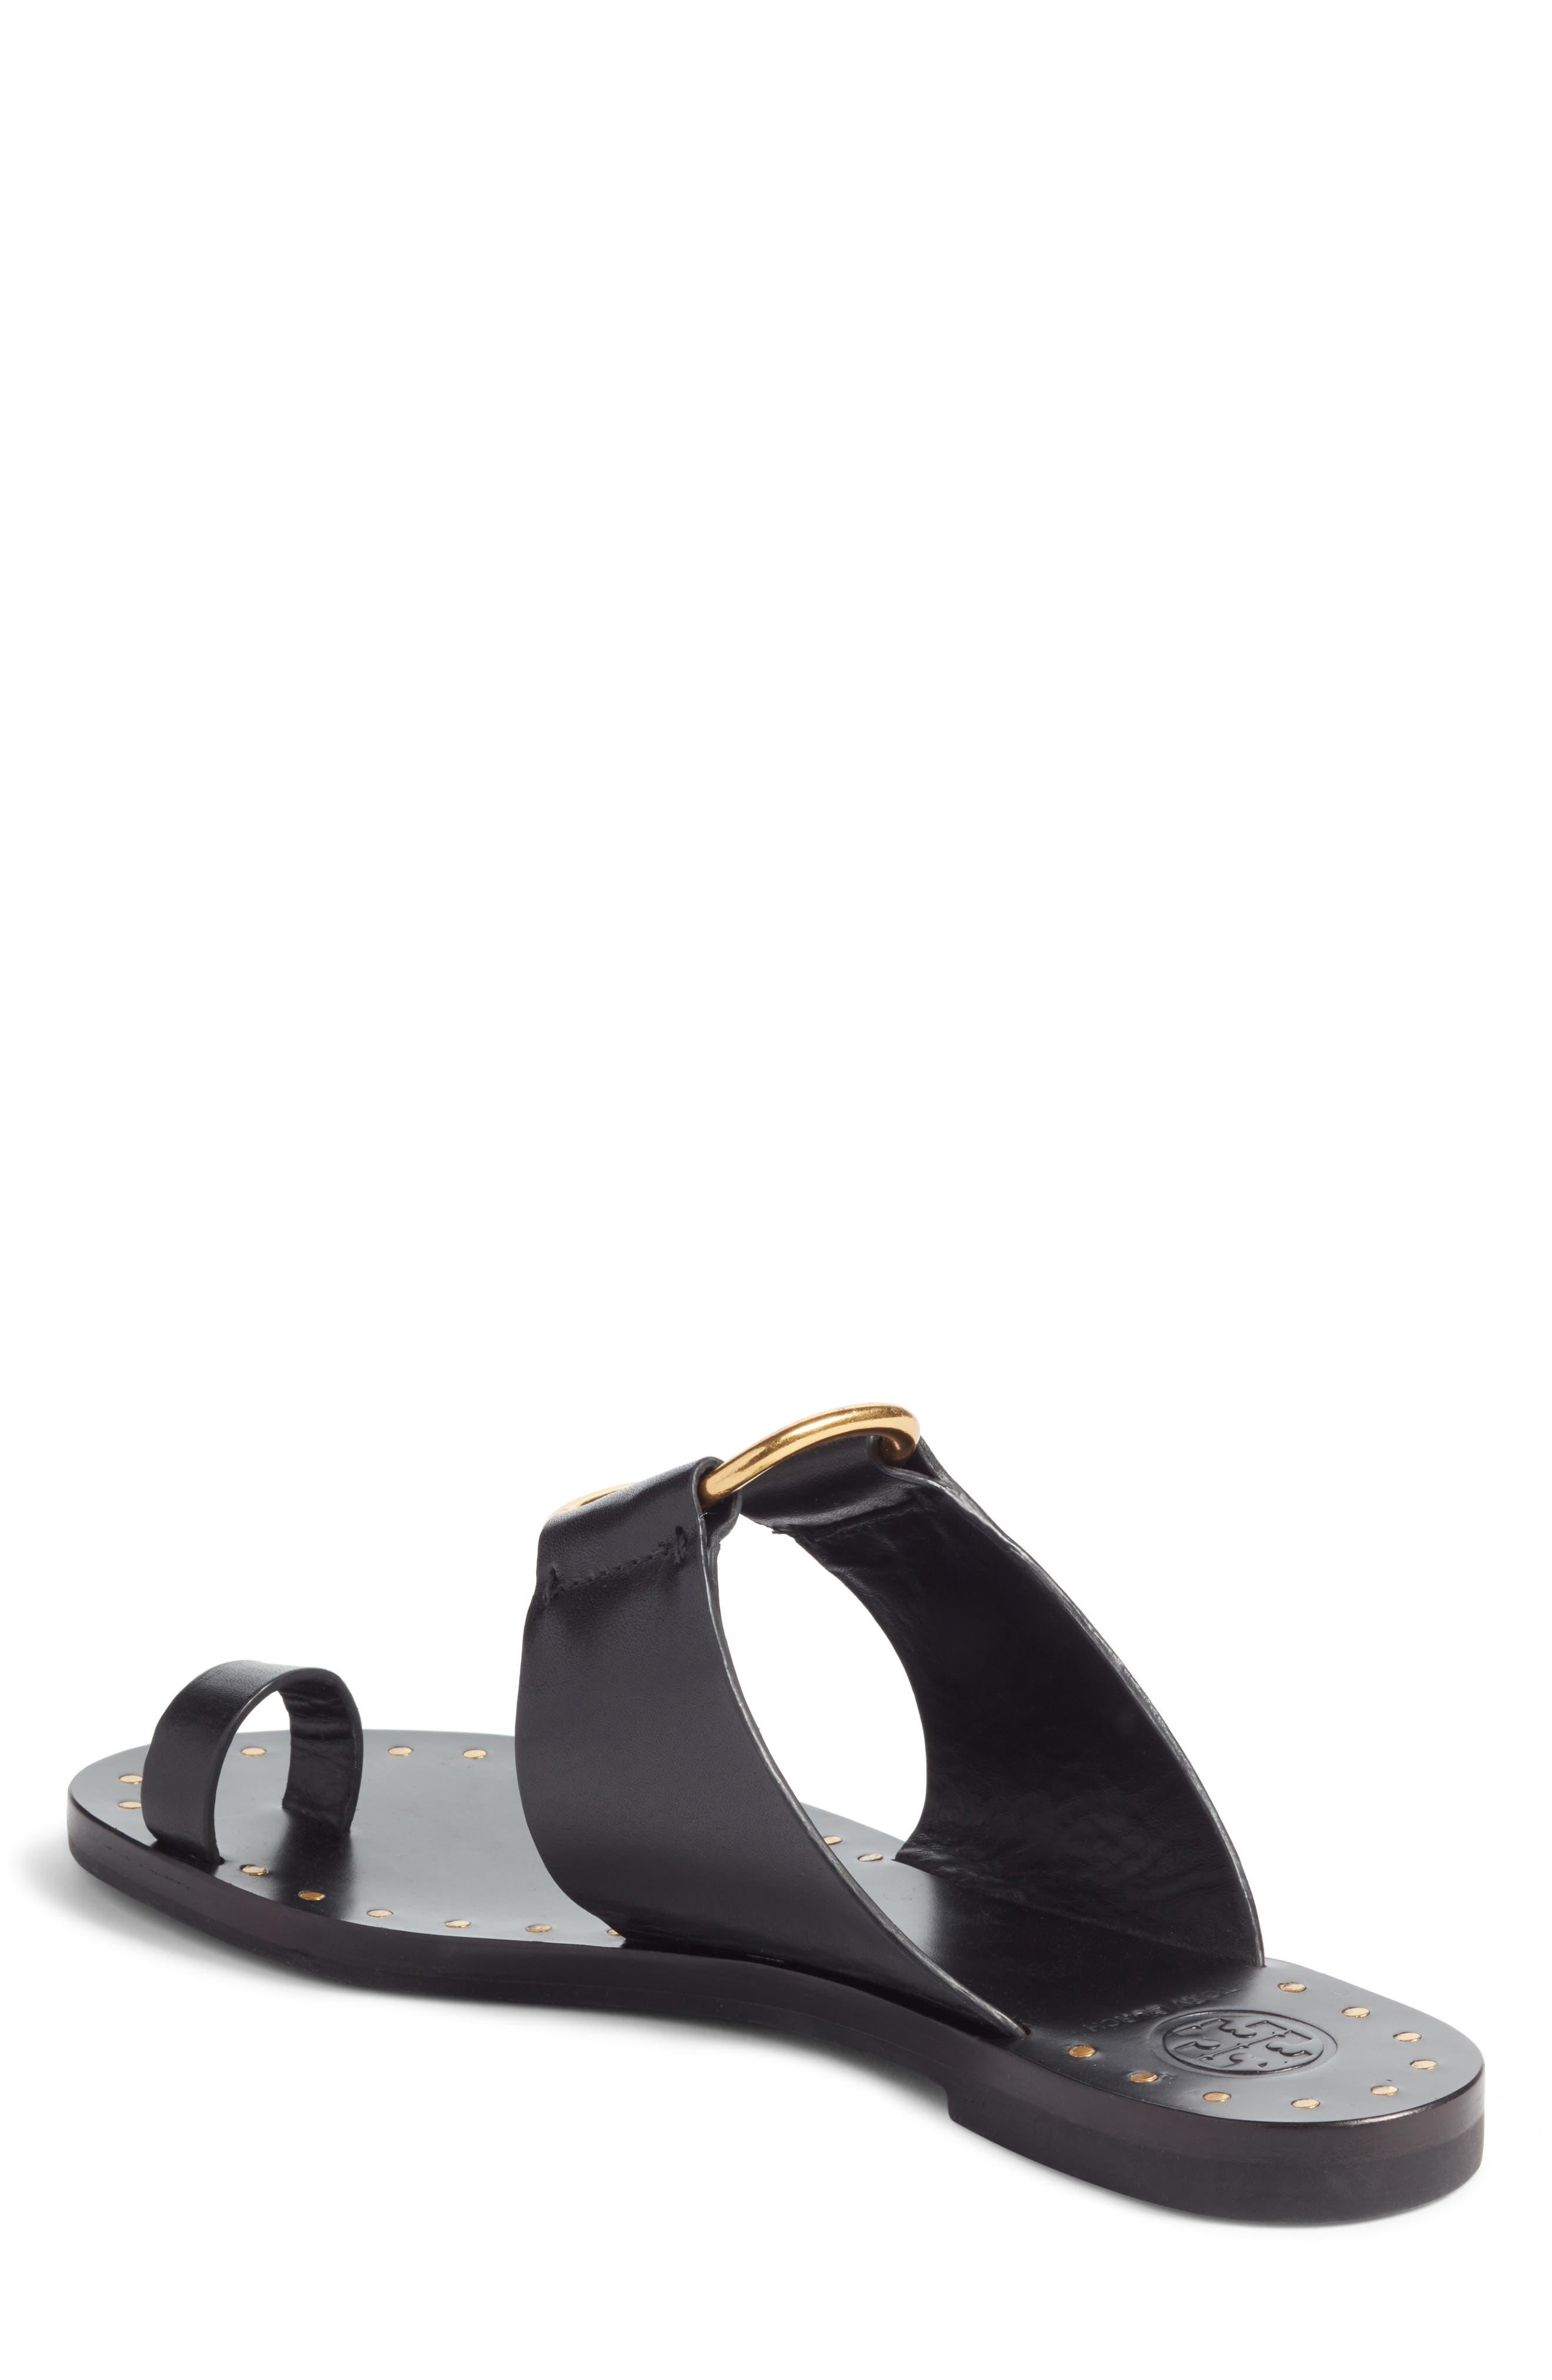 Brannan Studded Sandal,                             Alternate thumbnail 2, color,                             Perfect Black